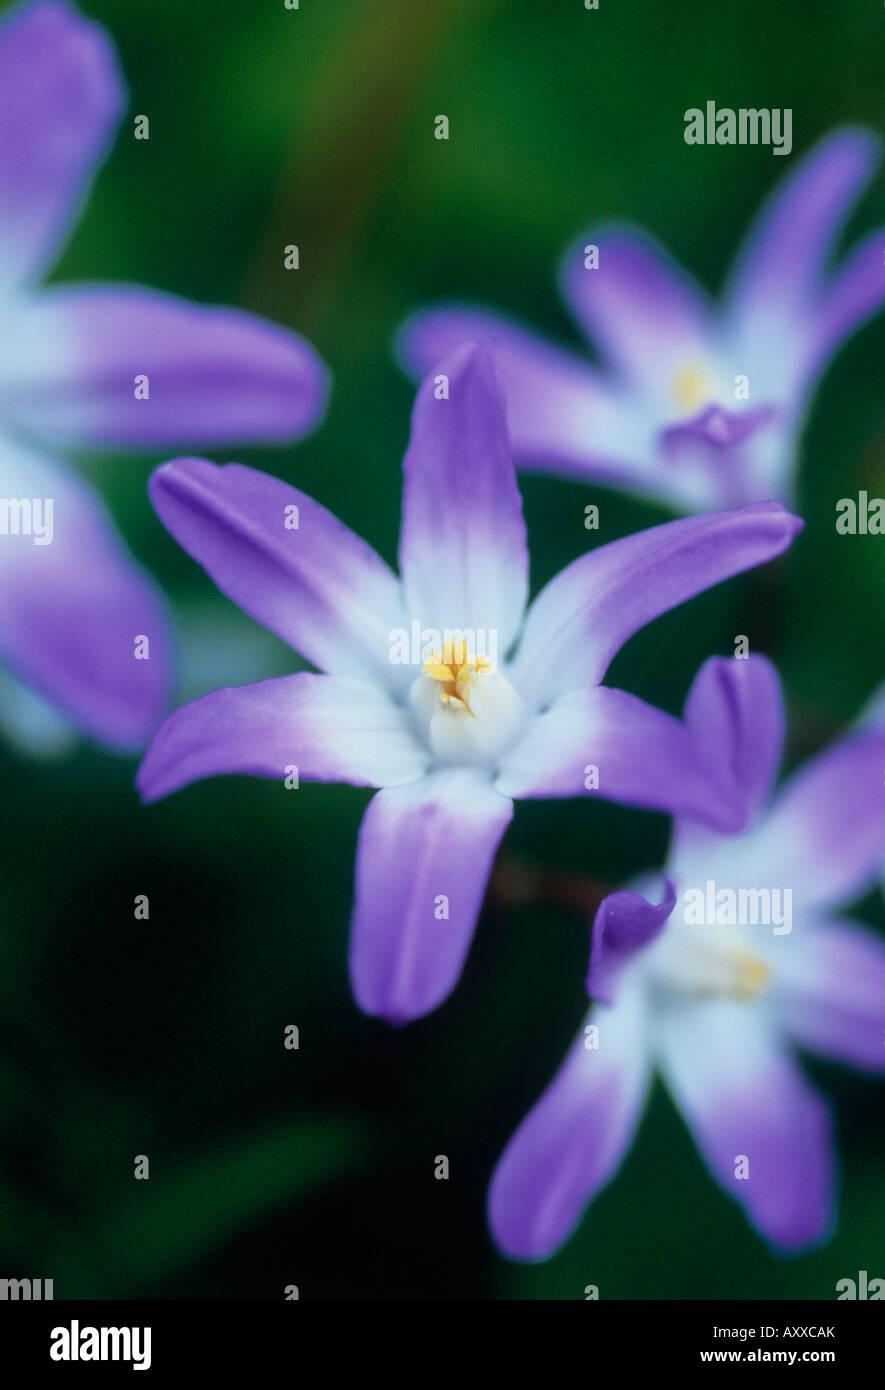 Glory-of-the-snow, Glory, of, the, snow, Chionodoxa, Purple, - Stock Image